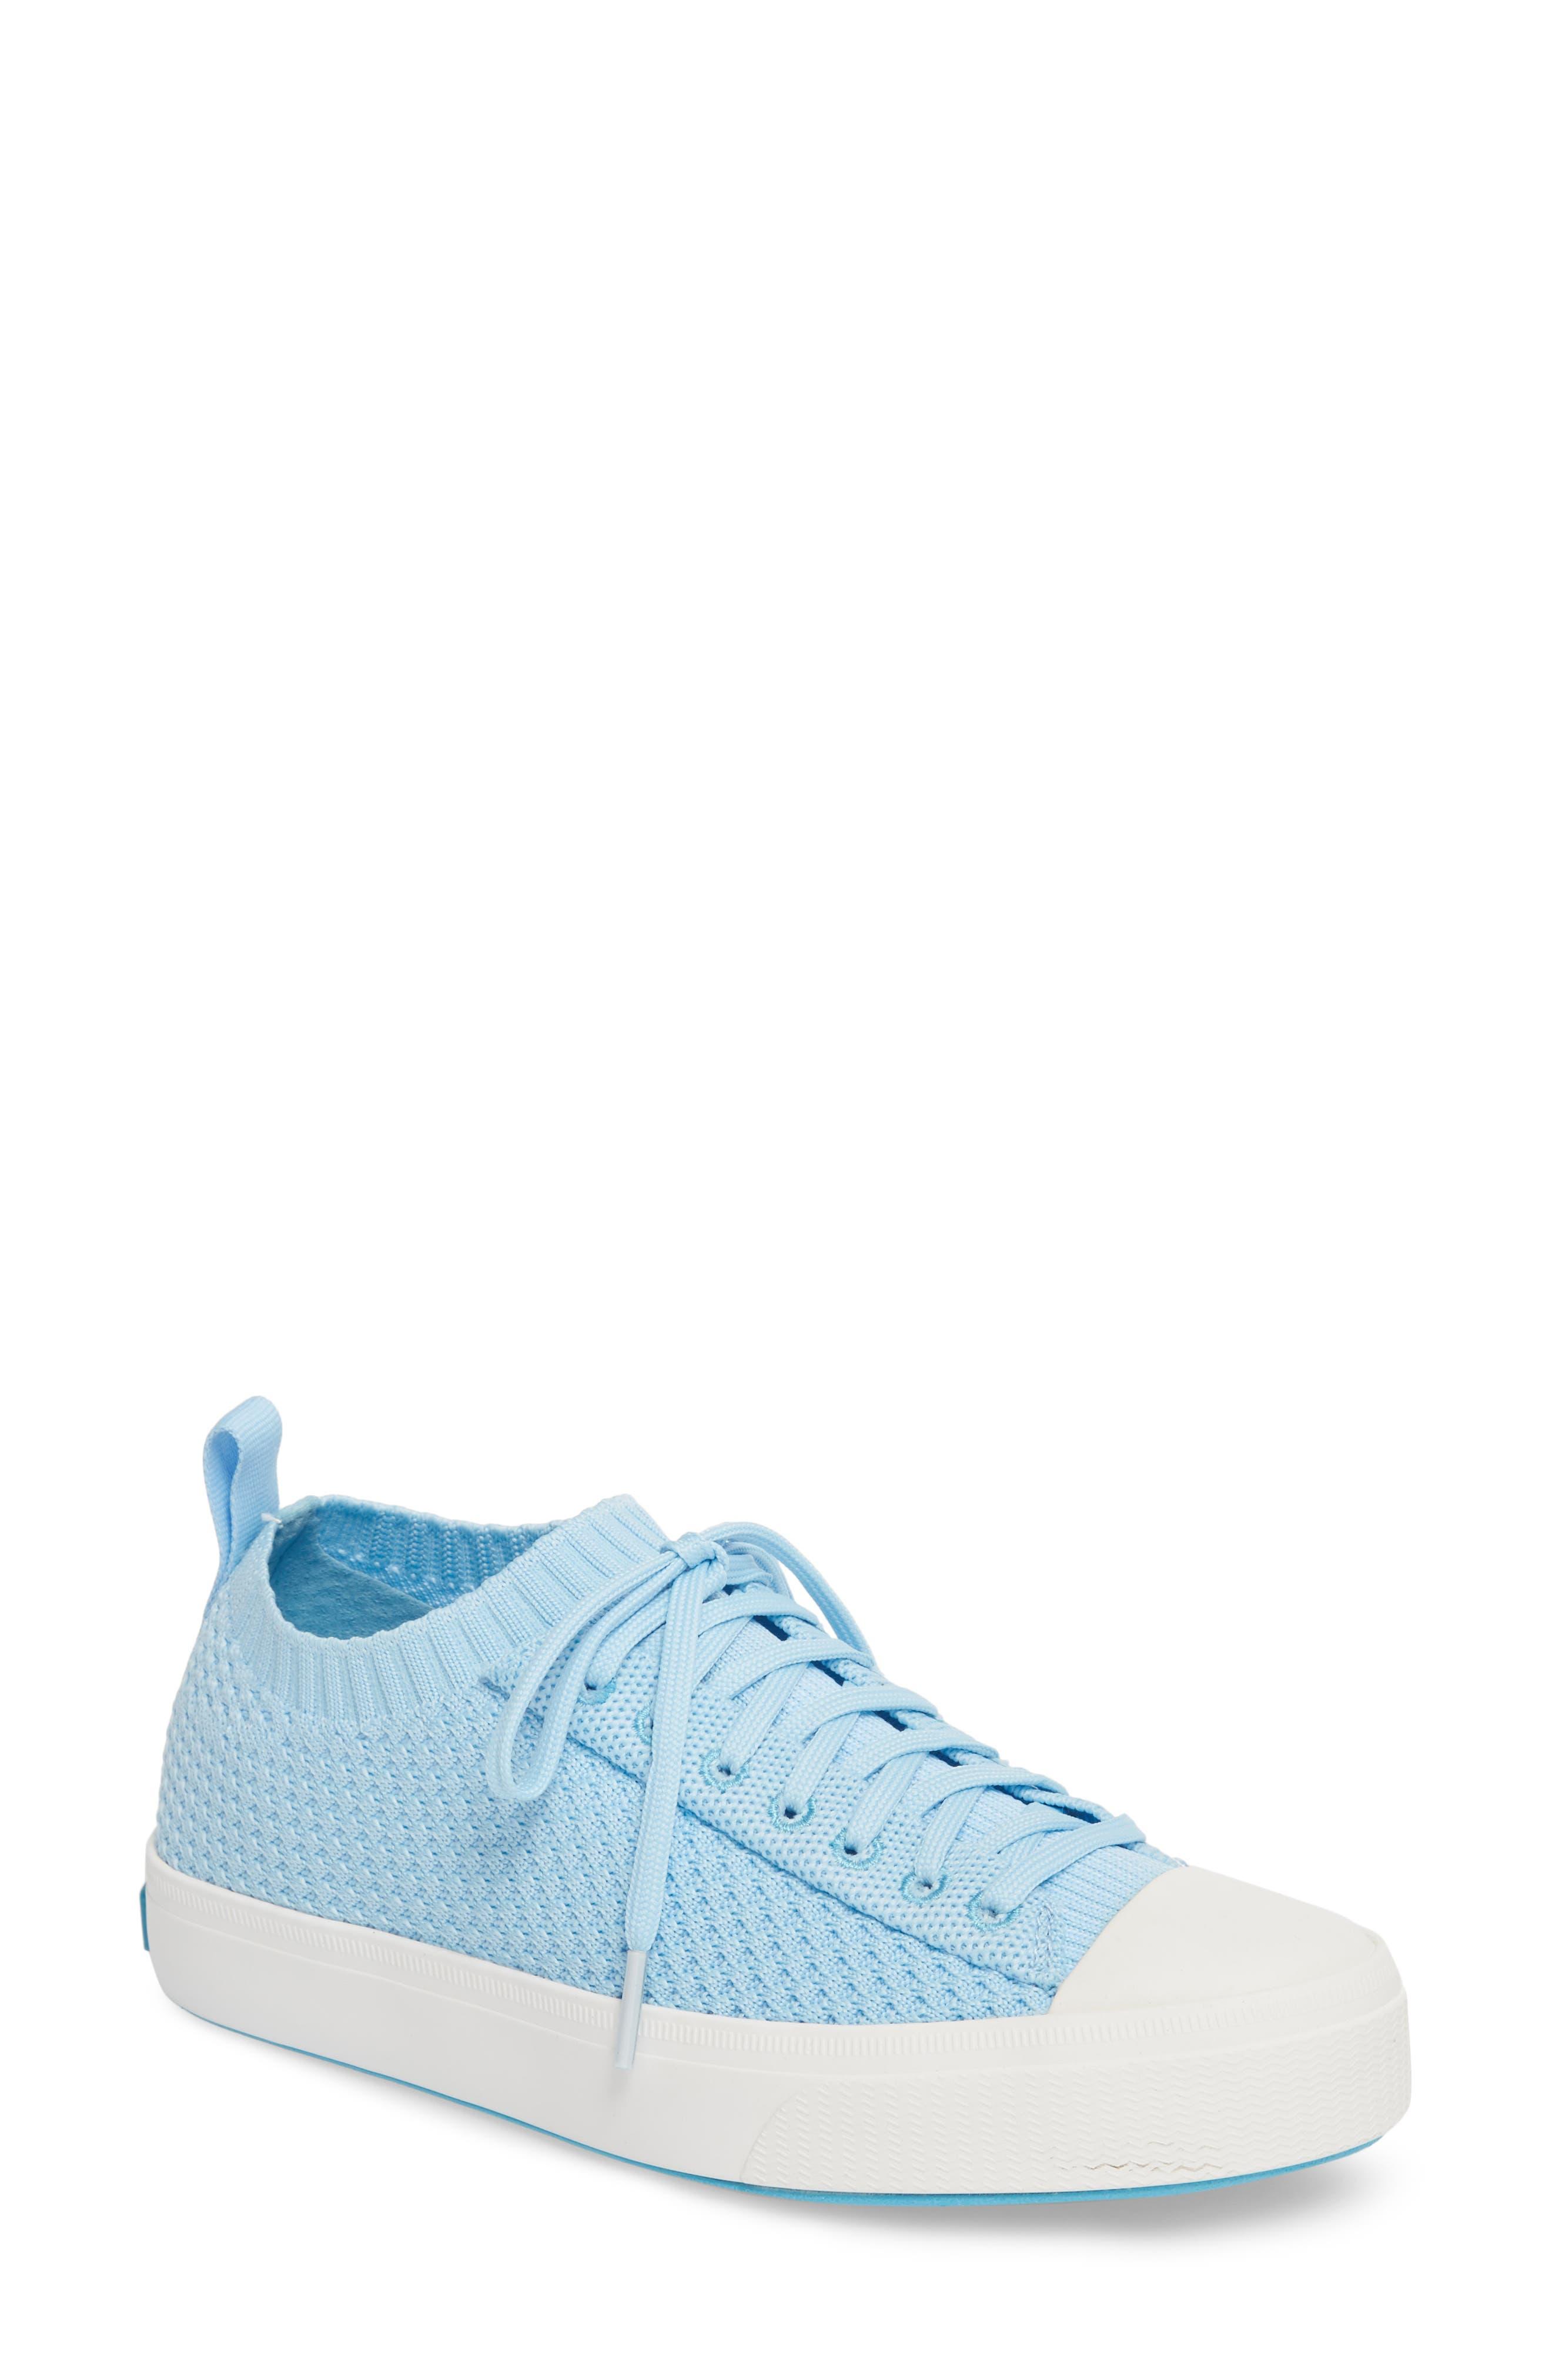 Jefferson 2.0 Liteknit Sneaker,                         Main,                         color, Sky Blue/ Shell White